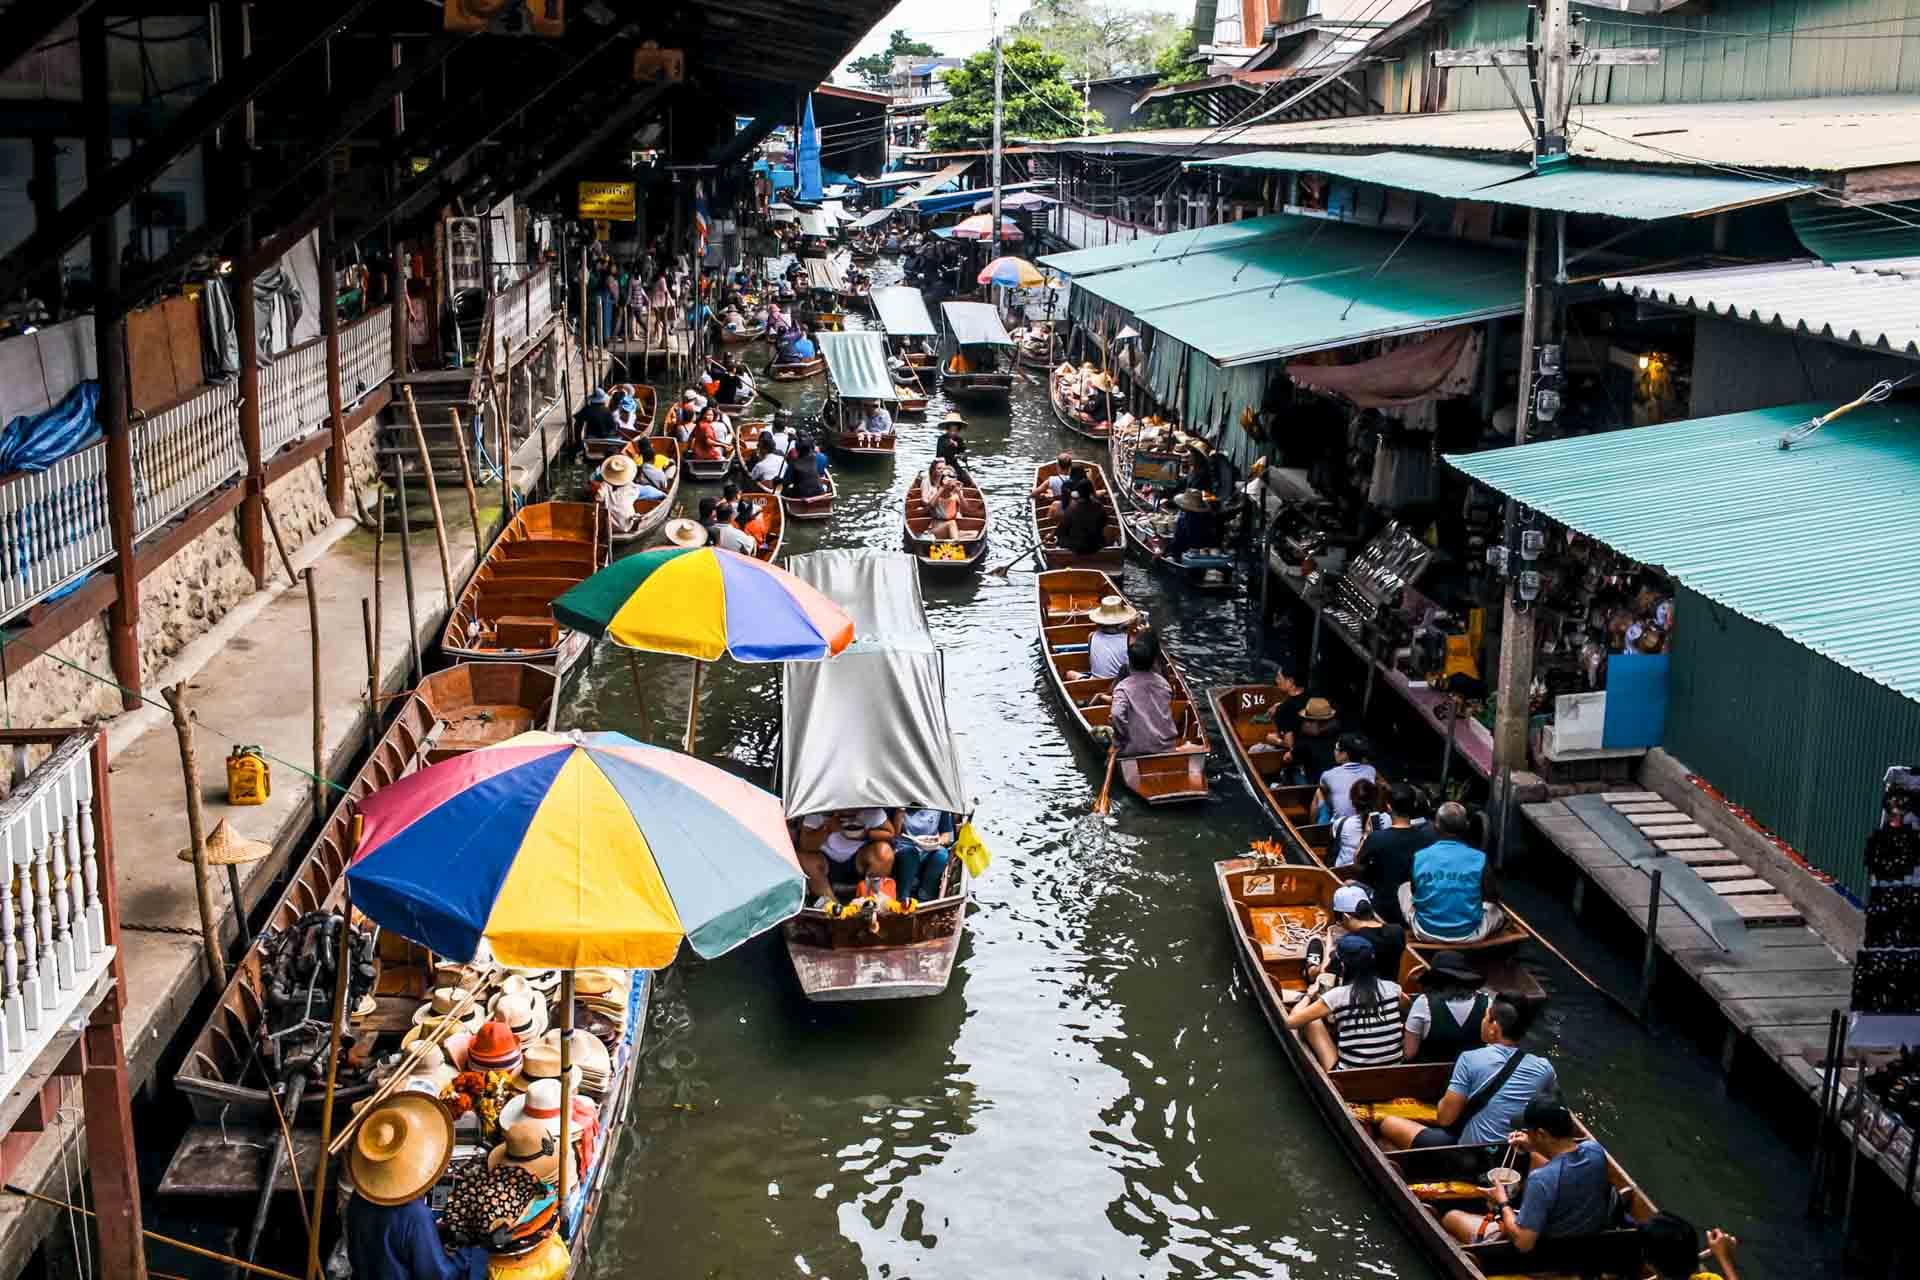 Les canaux de Bangkok © Frida Aguilar